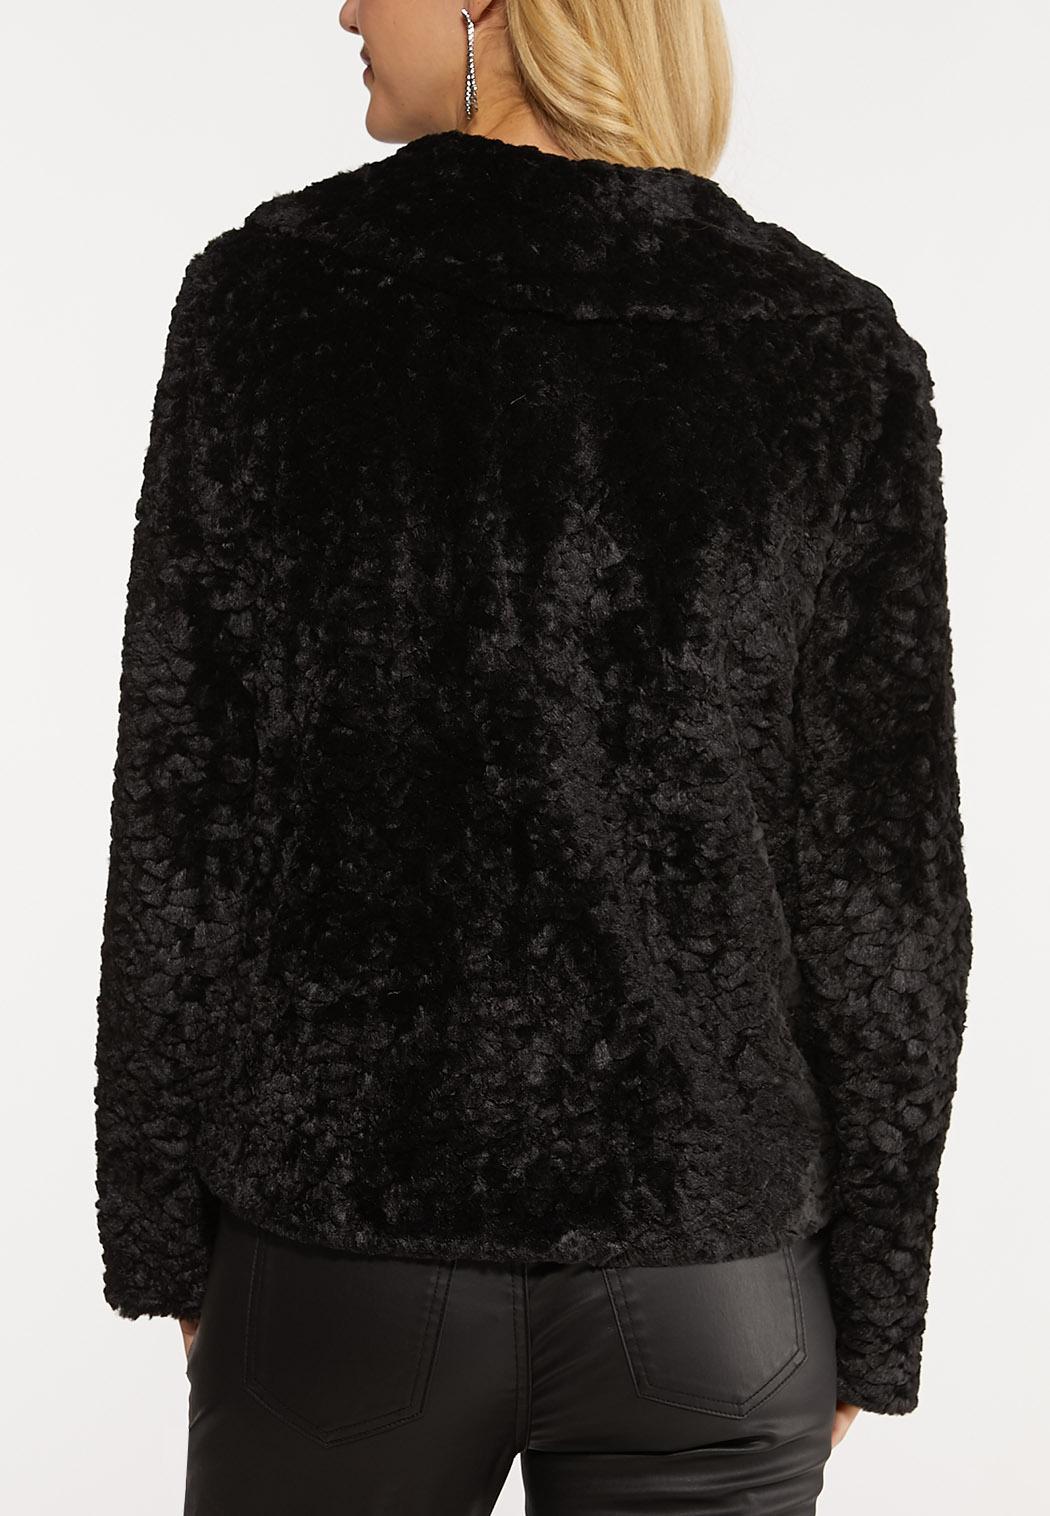 Black Fur Jacket (Item #44070843)